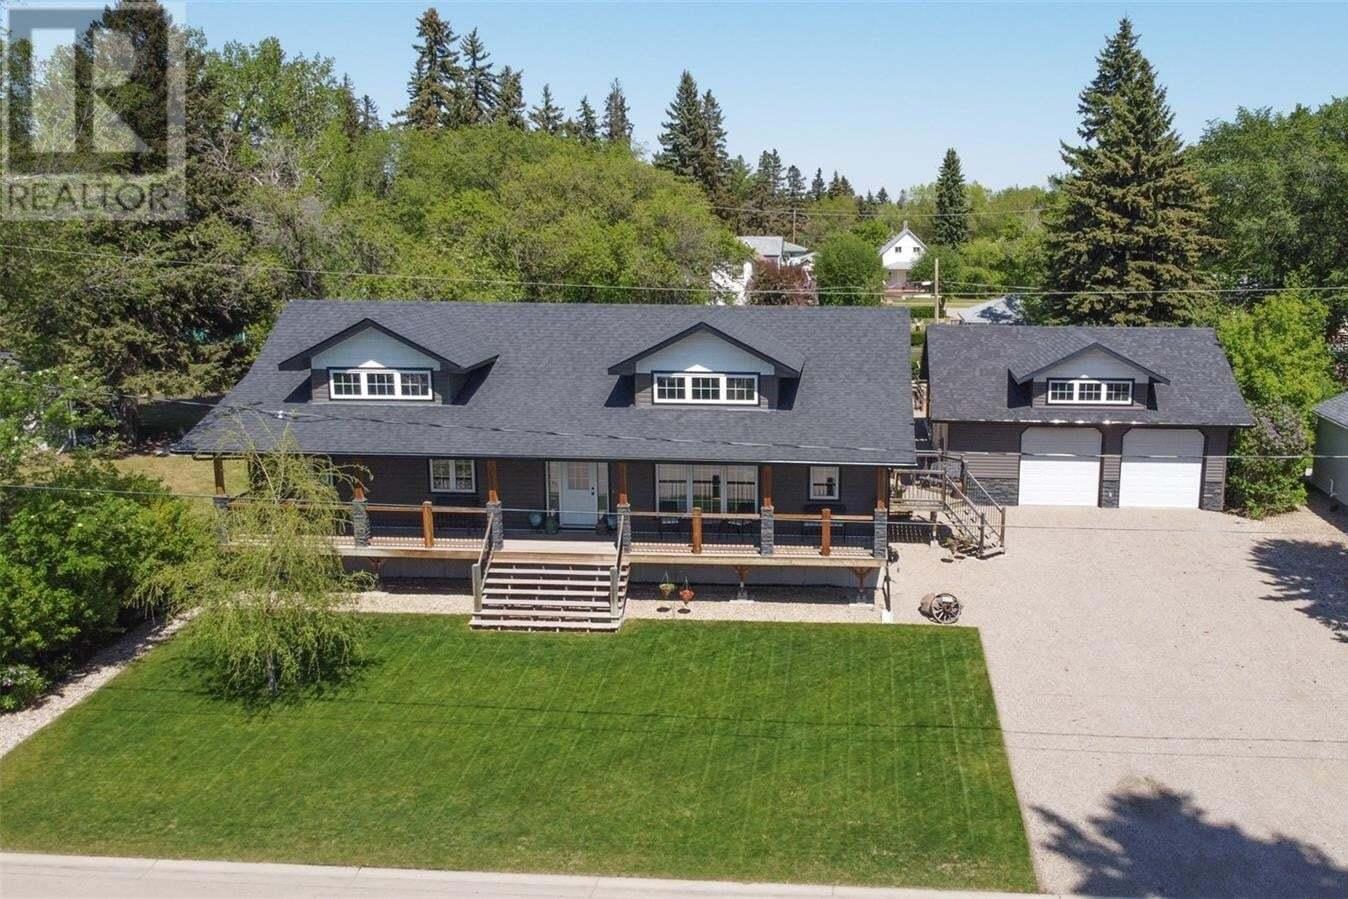 House for sale at 813 Houghton St Indian Head Saskatchewan - MLS: SK810670